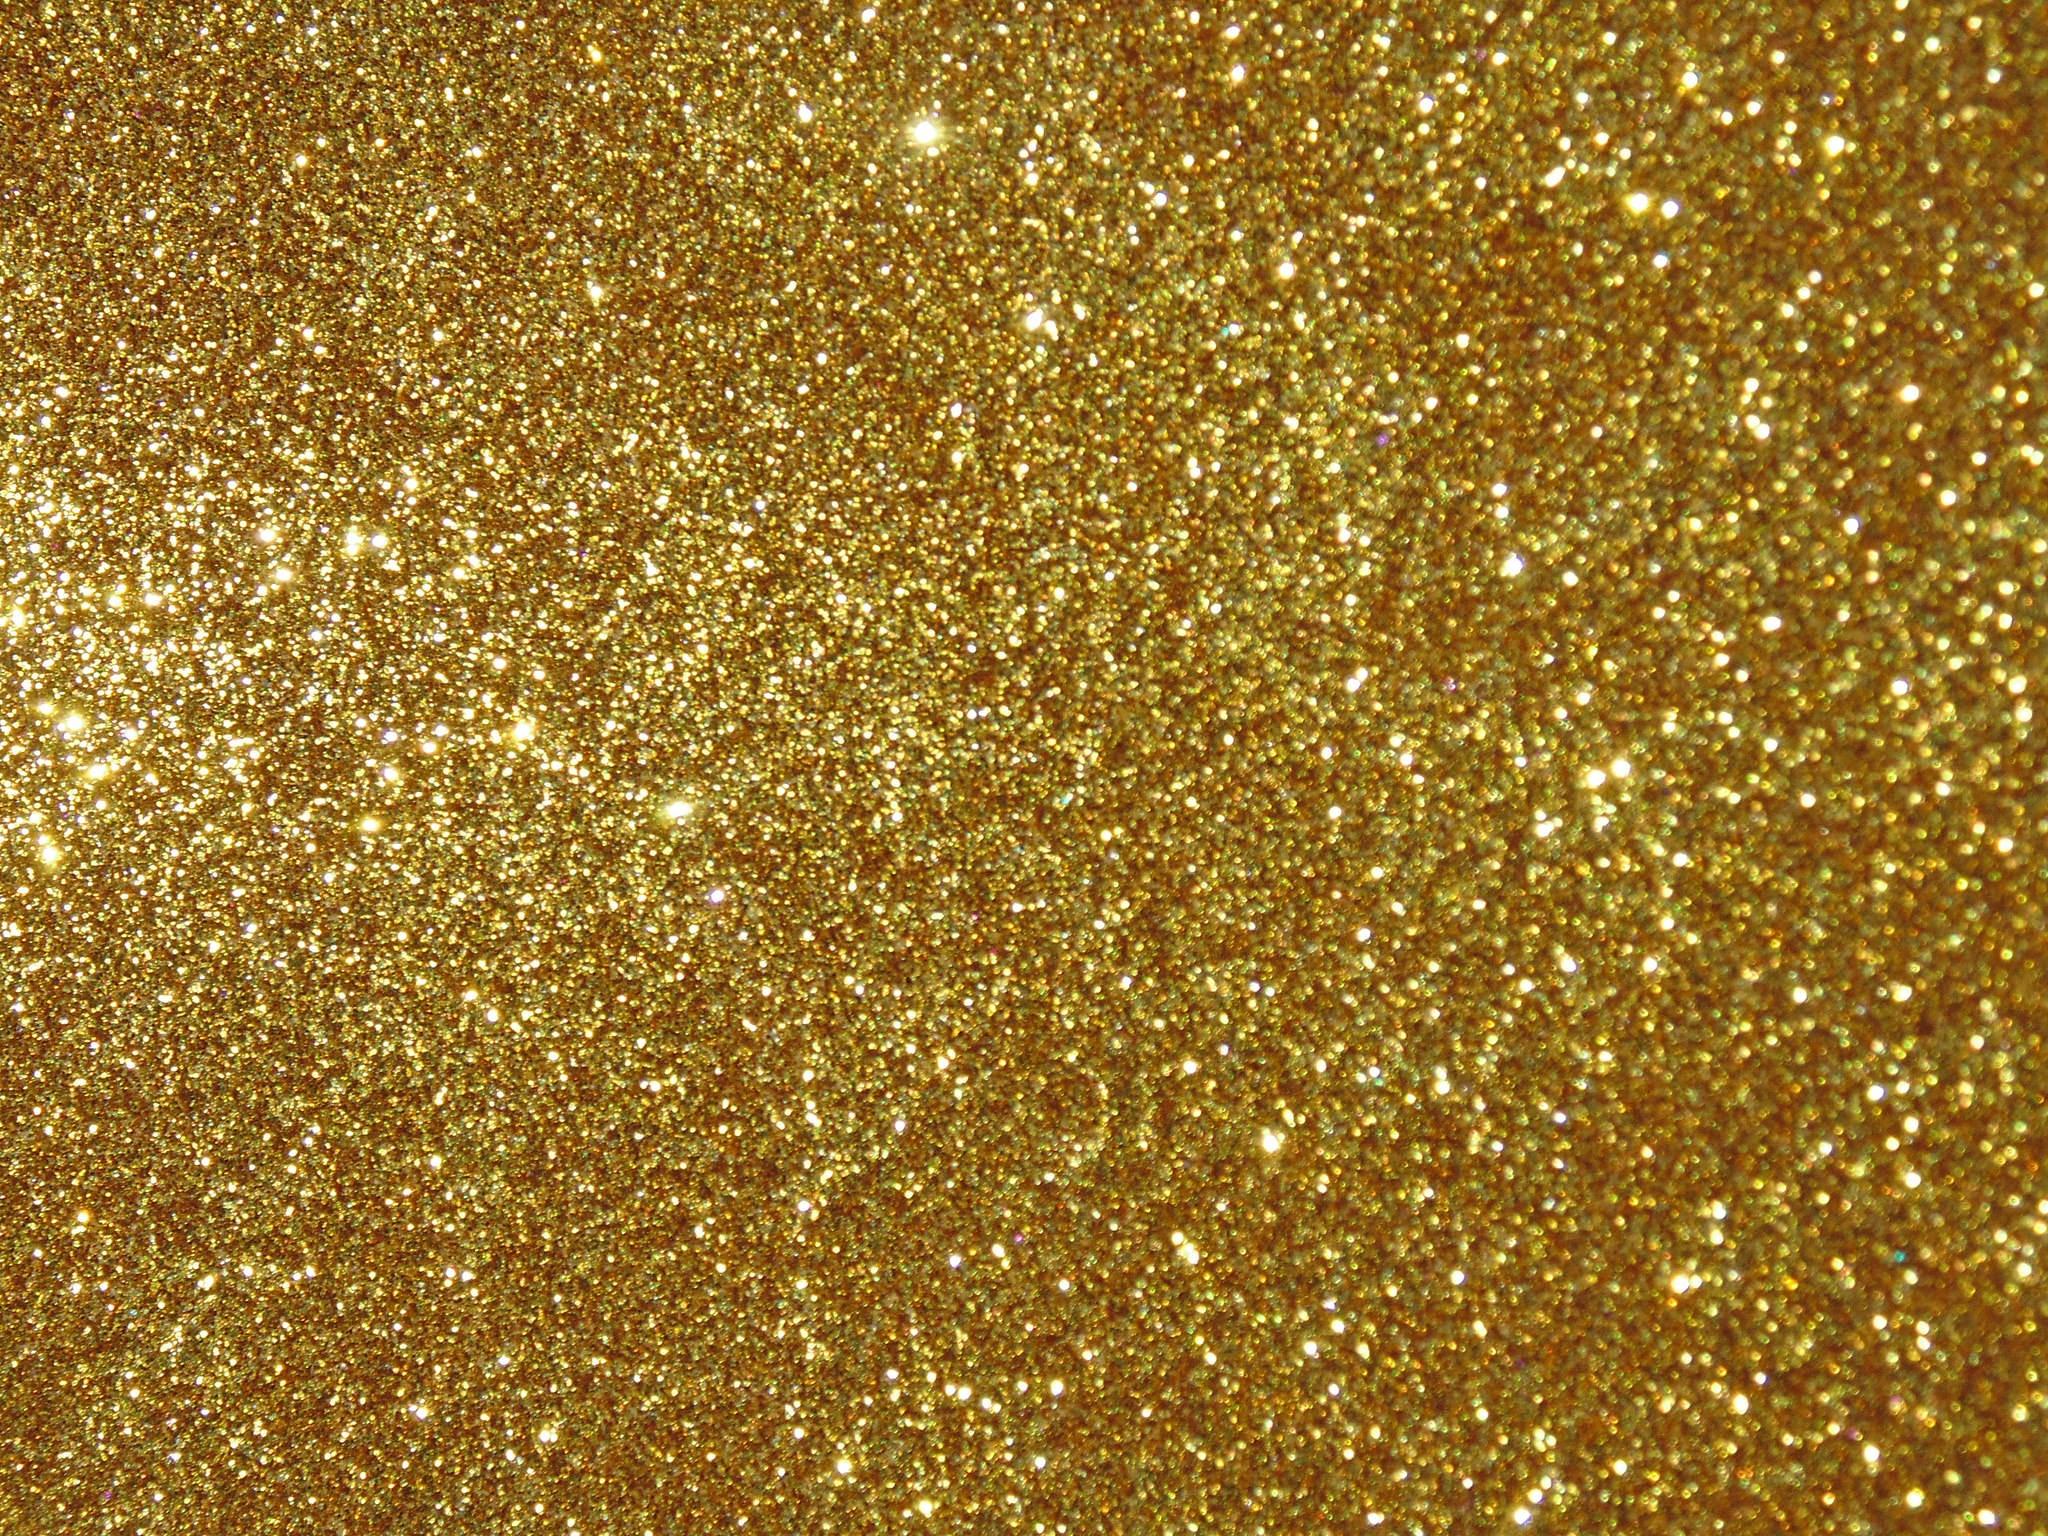 Fantastic Wallpaper Home Screen Glitter - 277251-glitter-background-2048x1536-for-android-40  Pic_744743.jpg